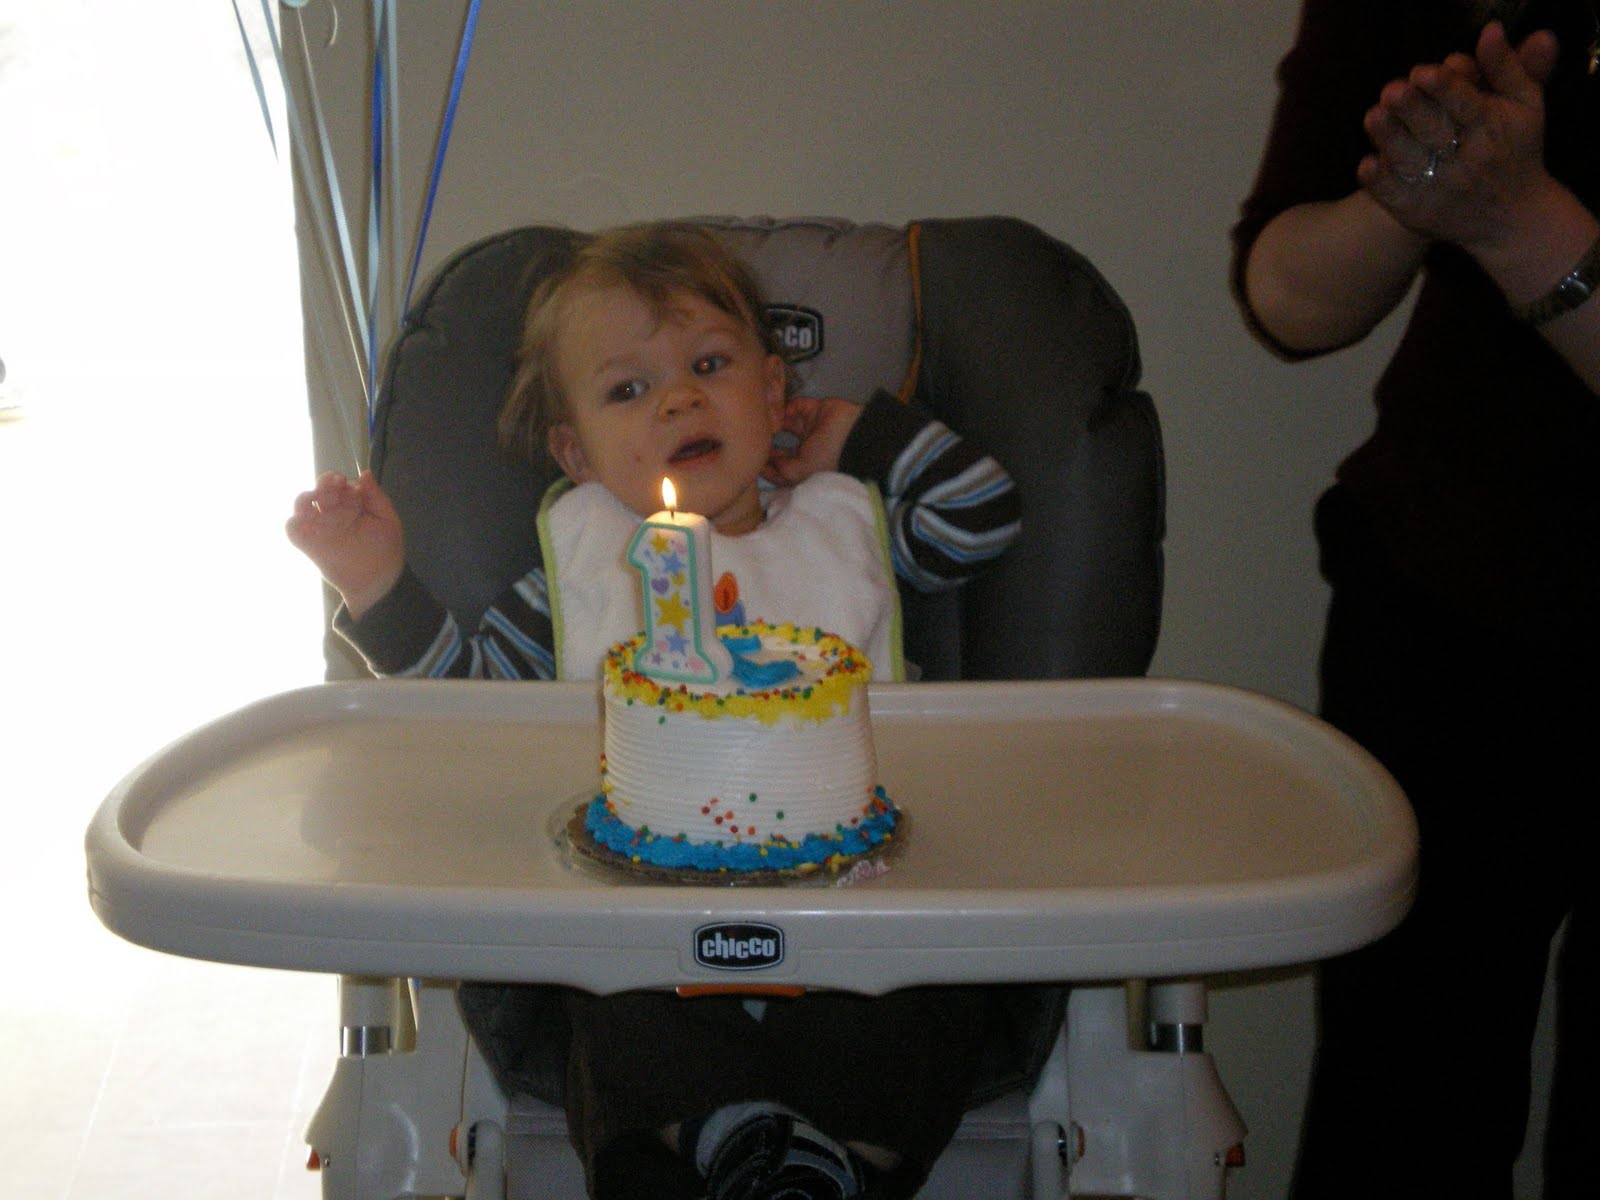 Tremendous 11 His Teeter Cakes Photo Harris Teeter Birthday Cakes Birthday Funny Birthday Cards Online Hendilapandamsfinfo